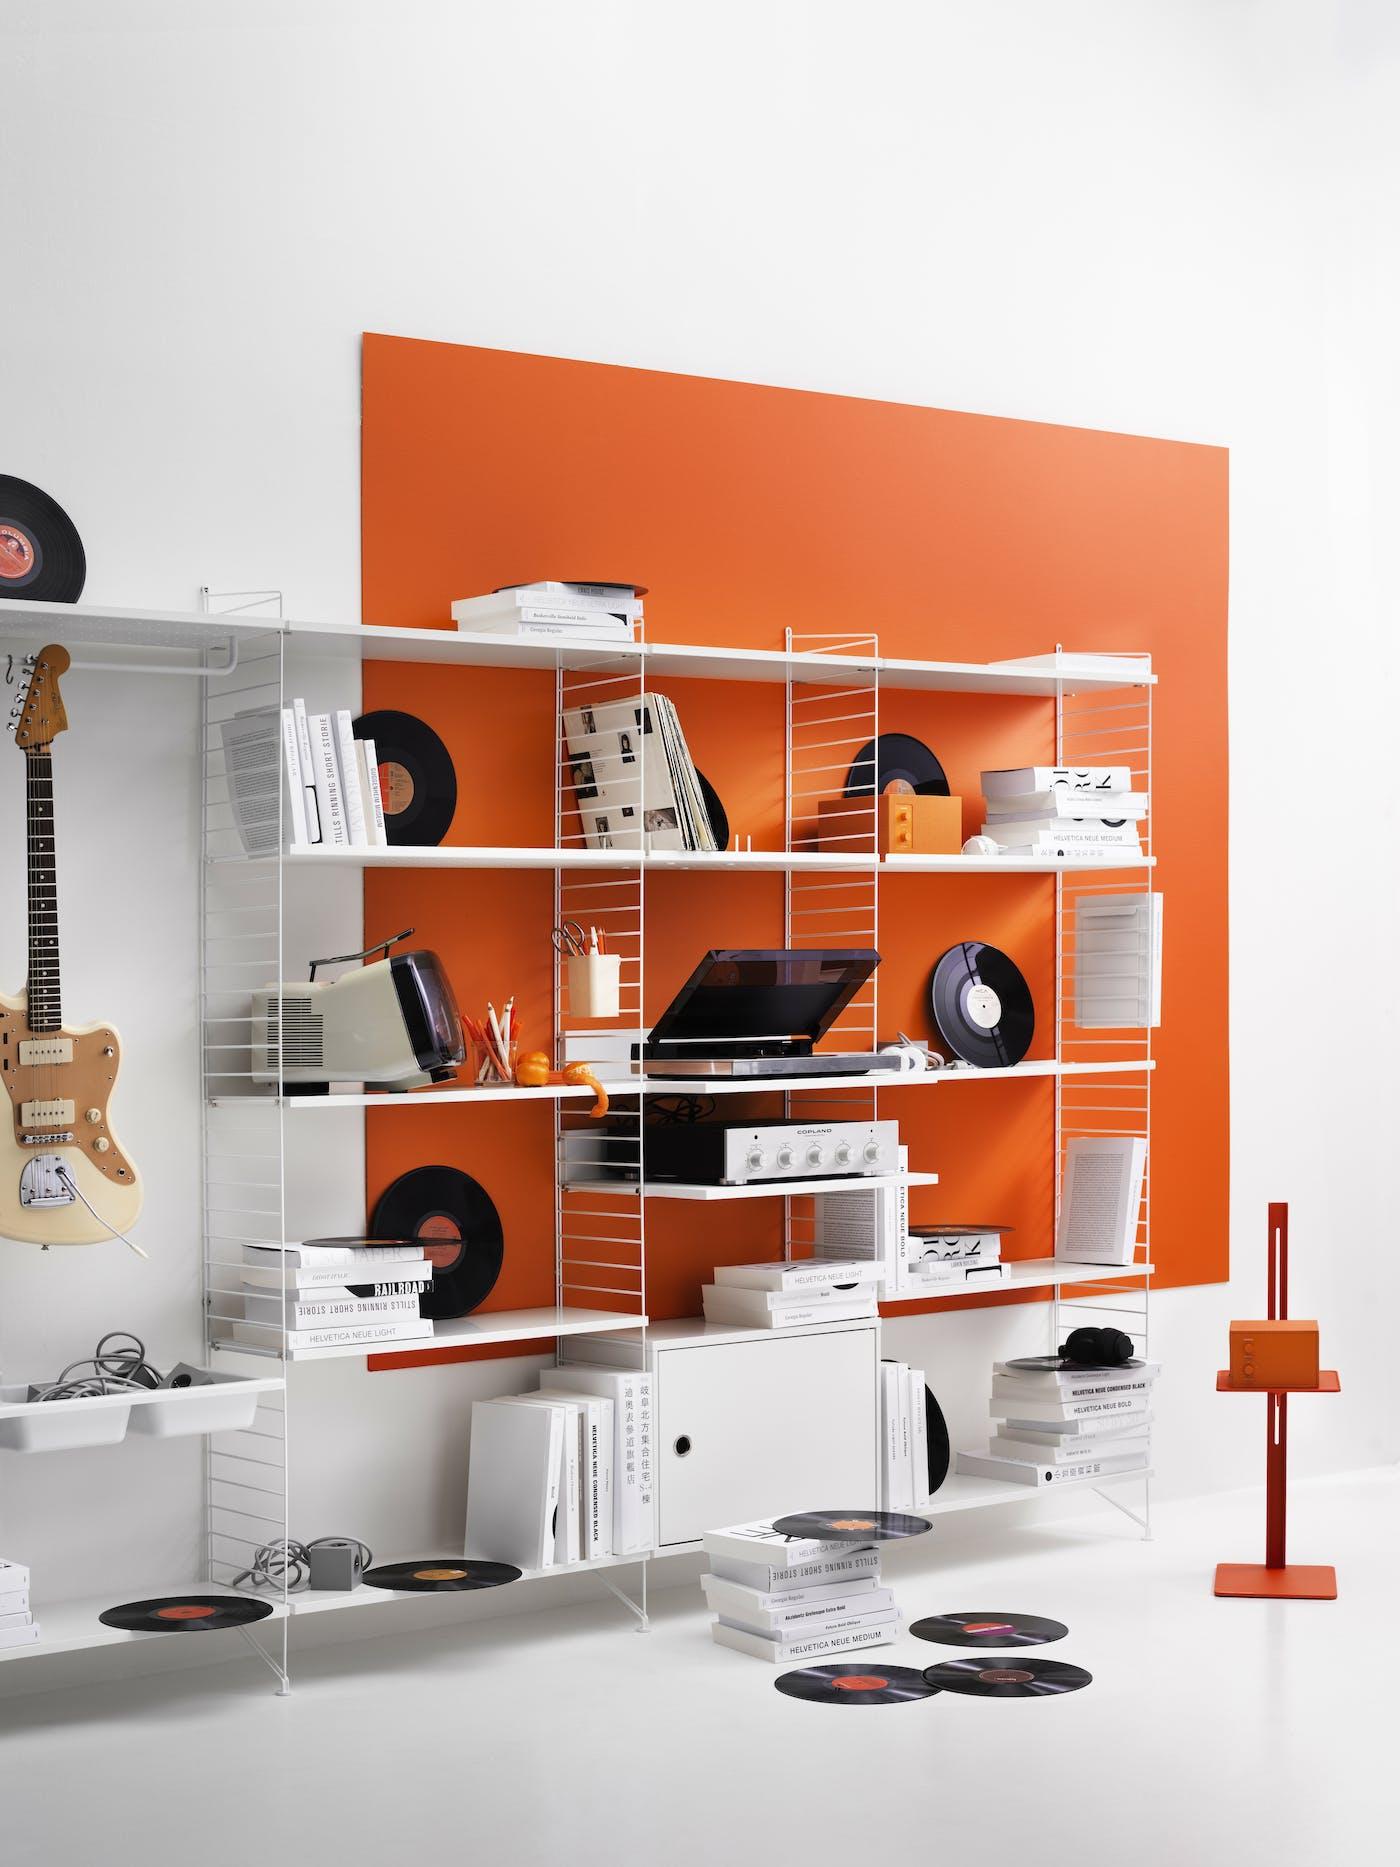 Inspiration string system museum living room white orange accessories metal floor panels portrait